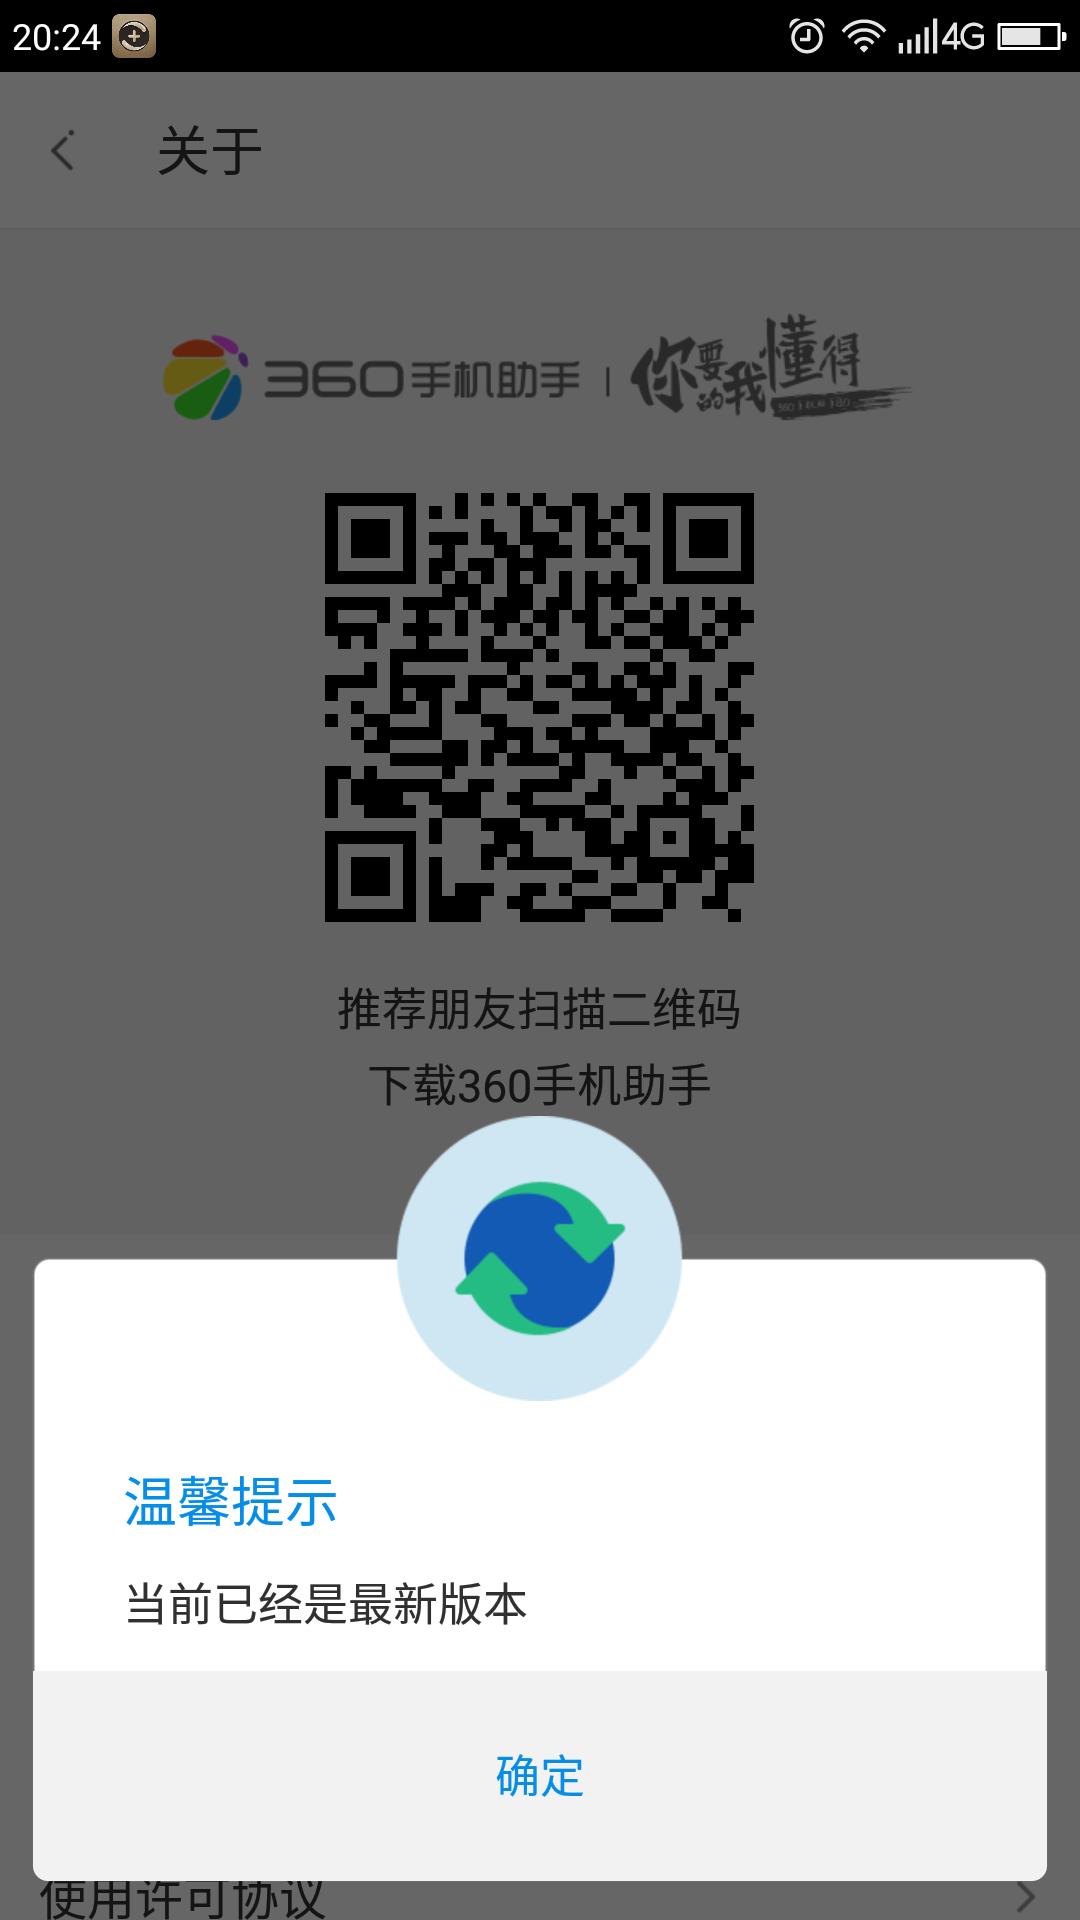 Screenshot_2019-12-16-20-24-13.png